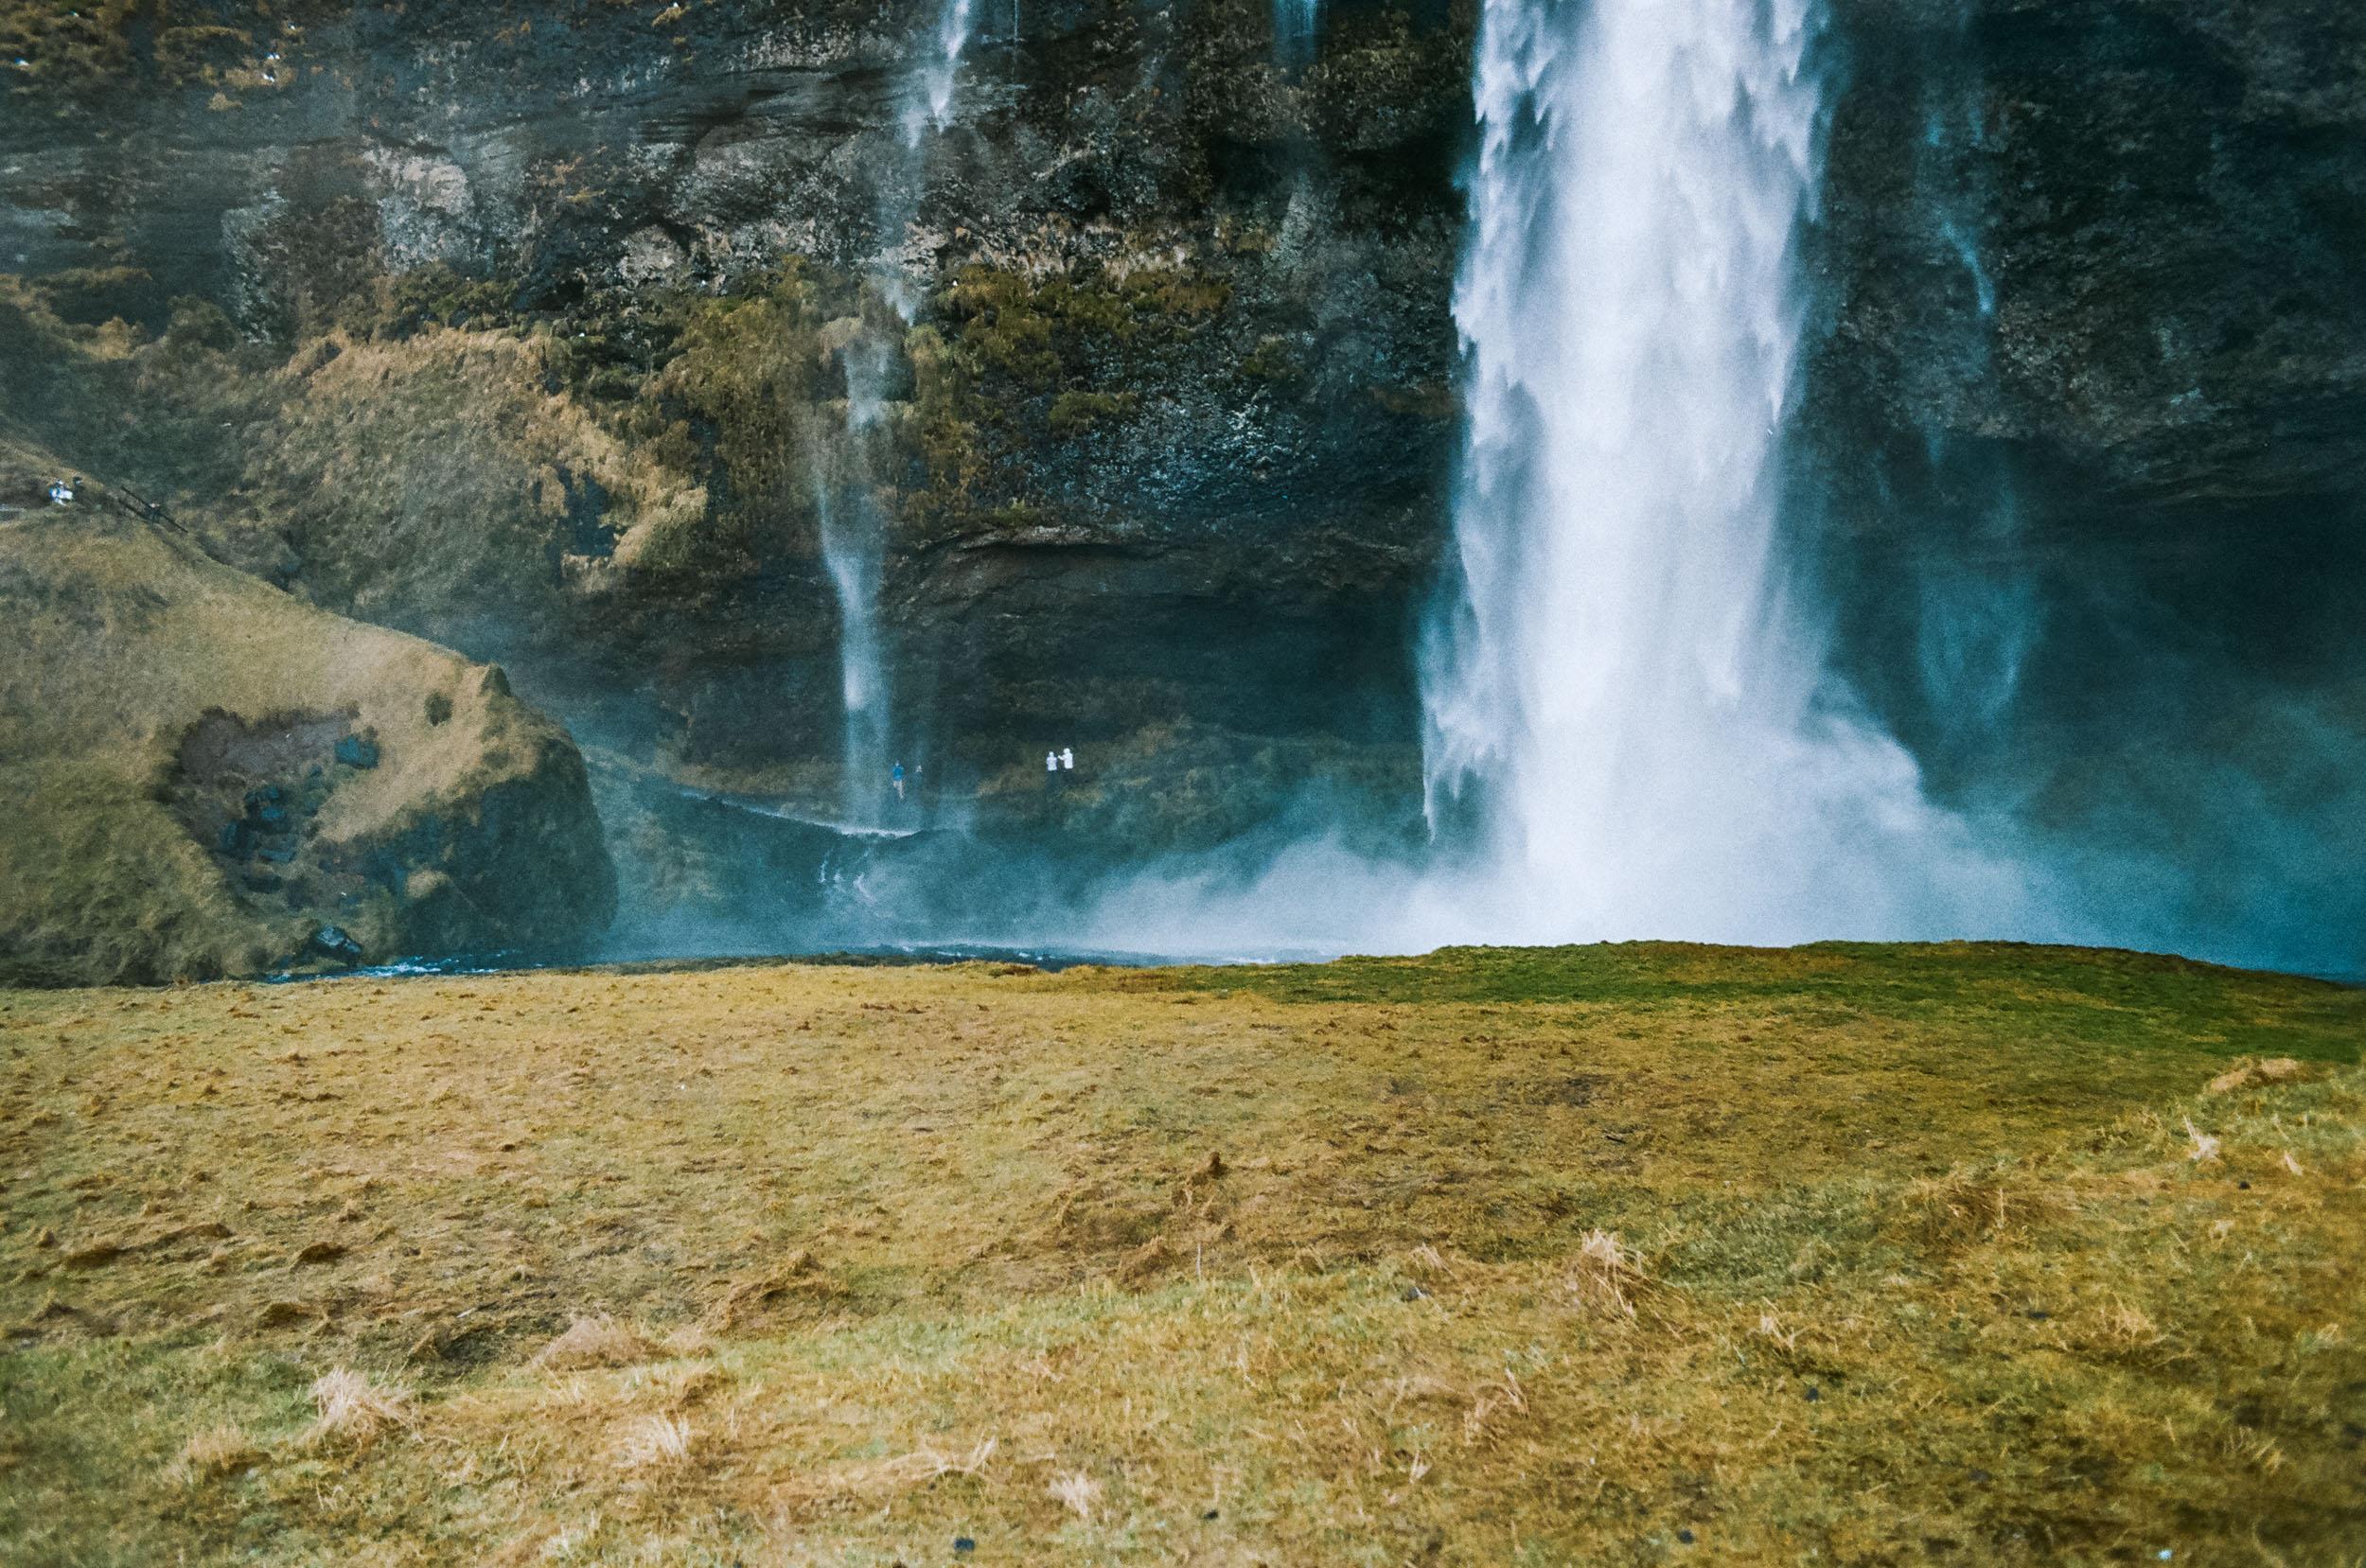 annadosenes-Travel diary-Water-13.jpg